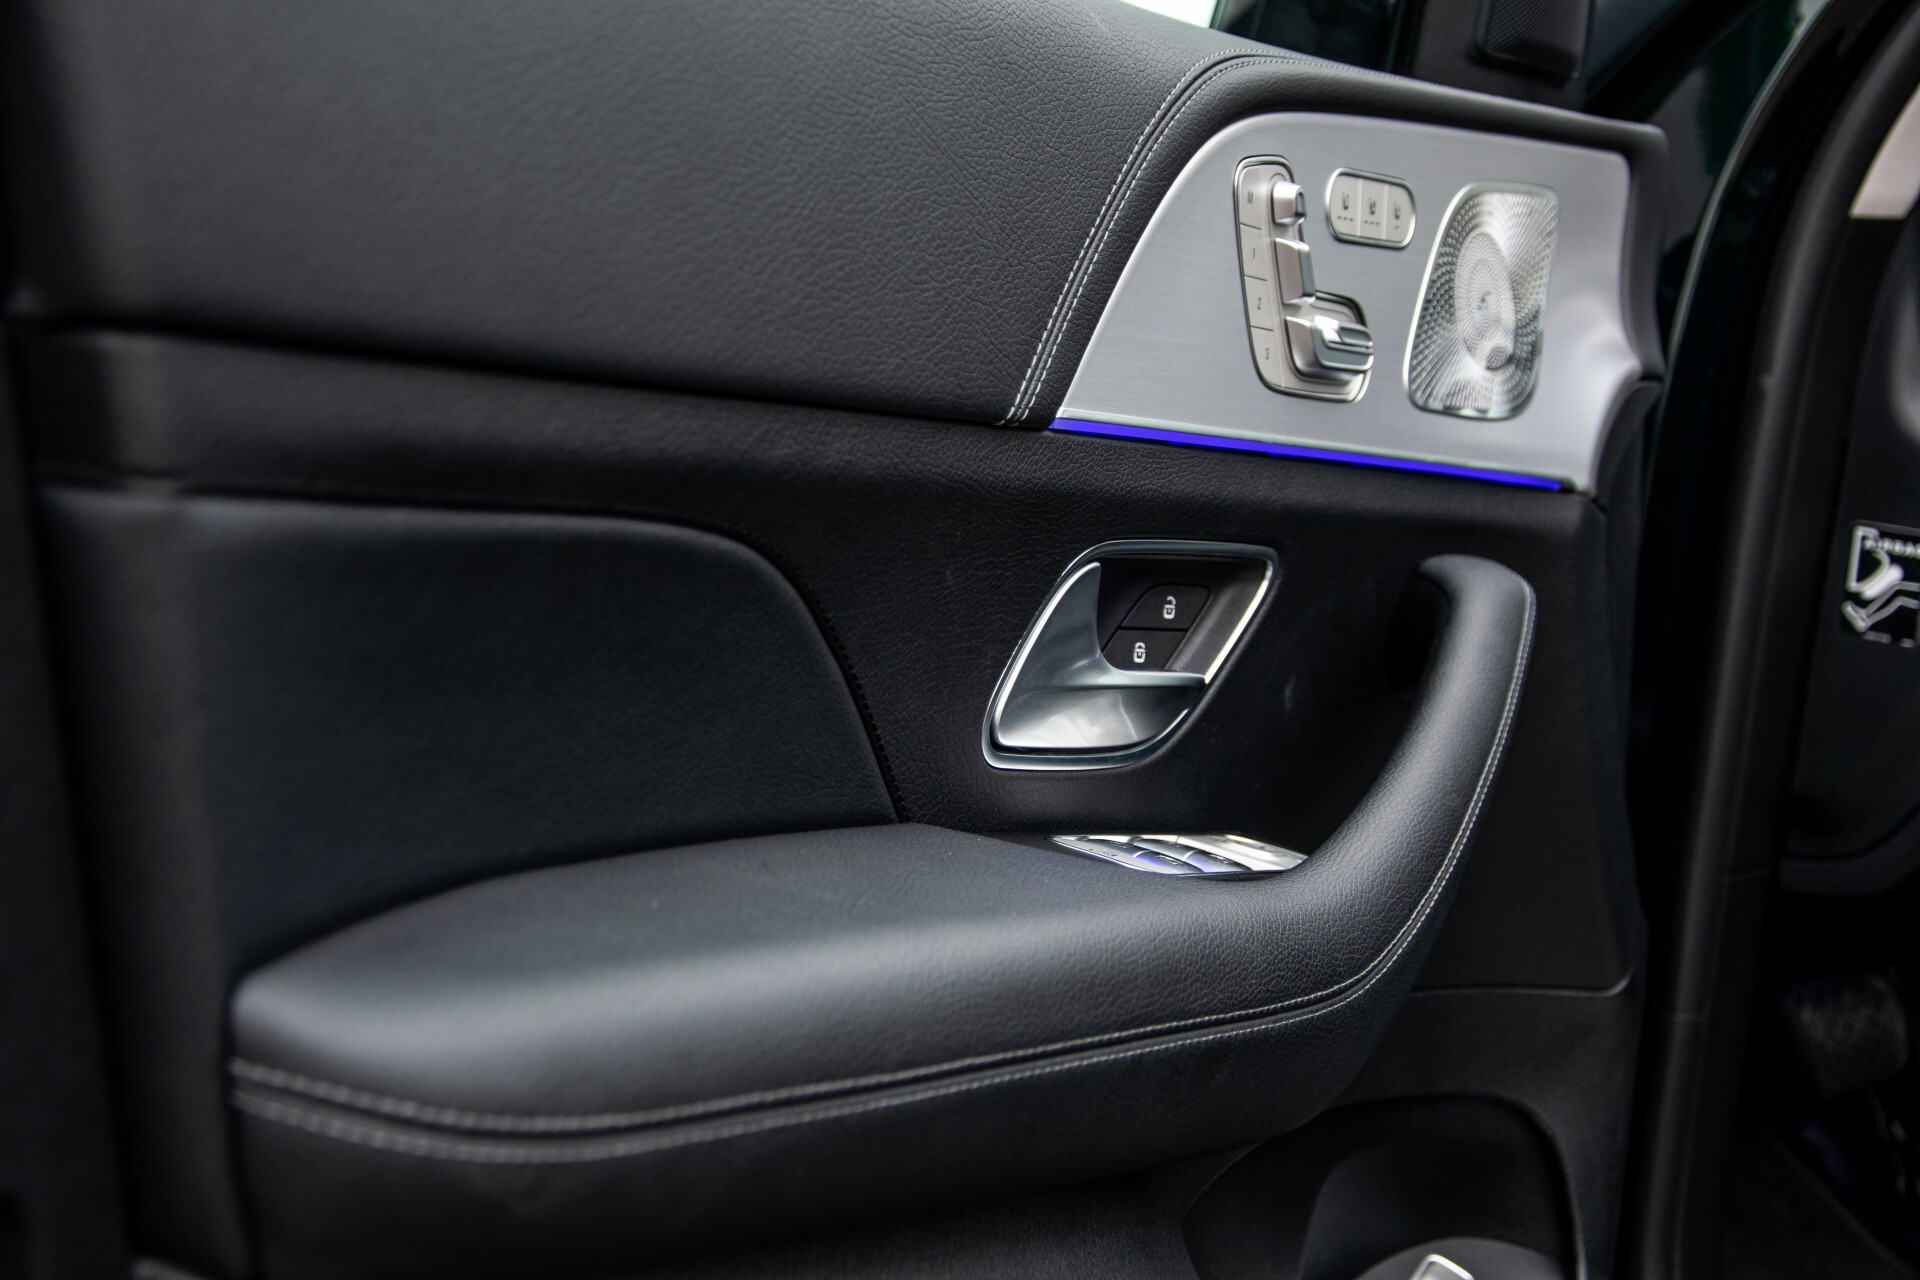 Mercedes-Benz GLE 450 4-M 7-Persoons AMG Massage/Rij-assist/Keyless/TV/360/Night/Trekhaak Aut9 Foto 35